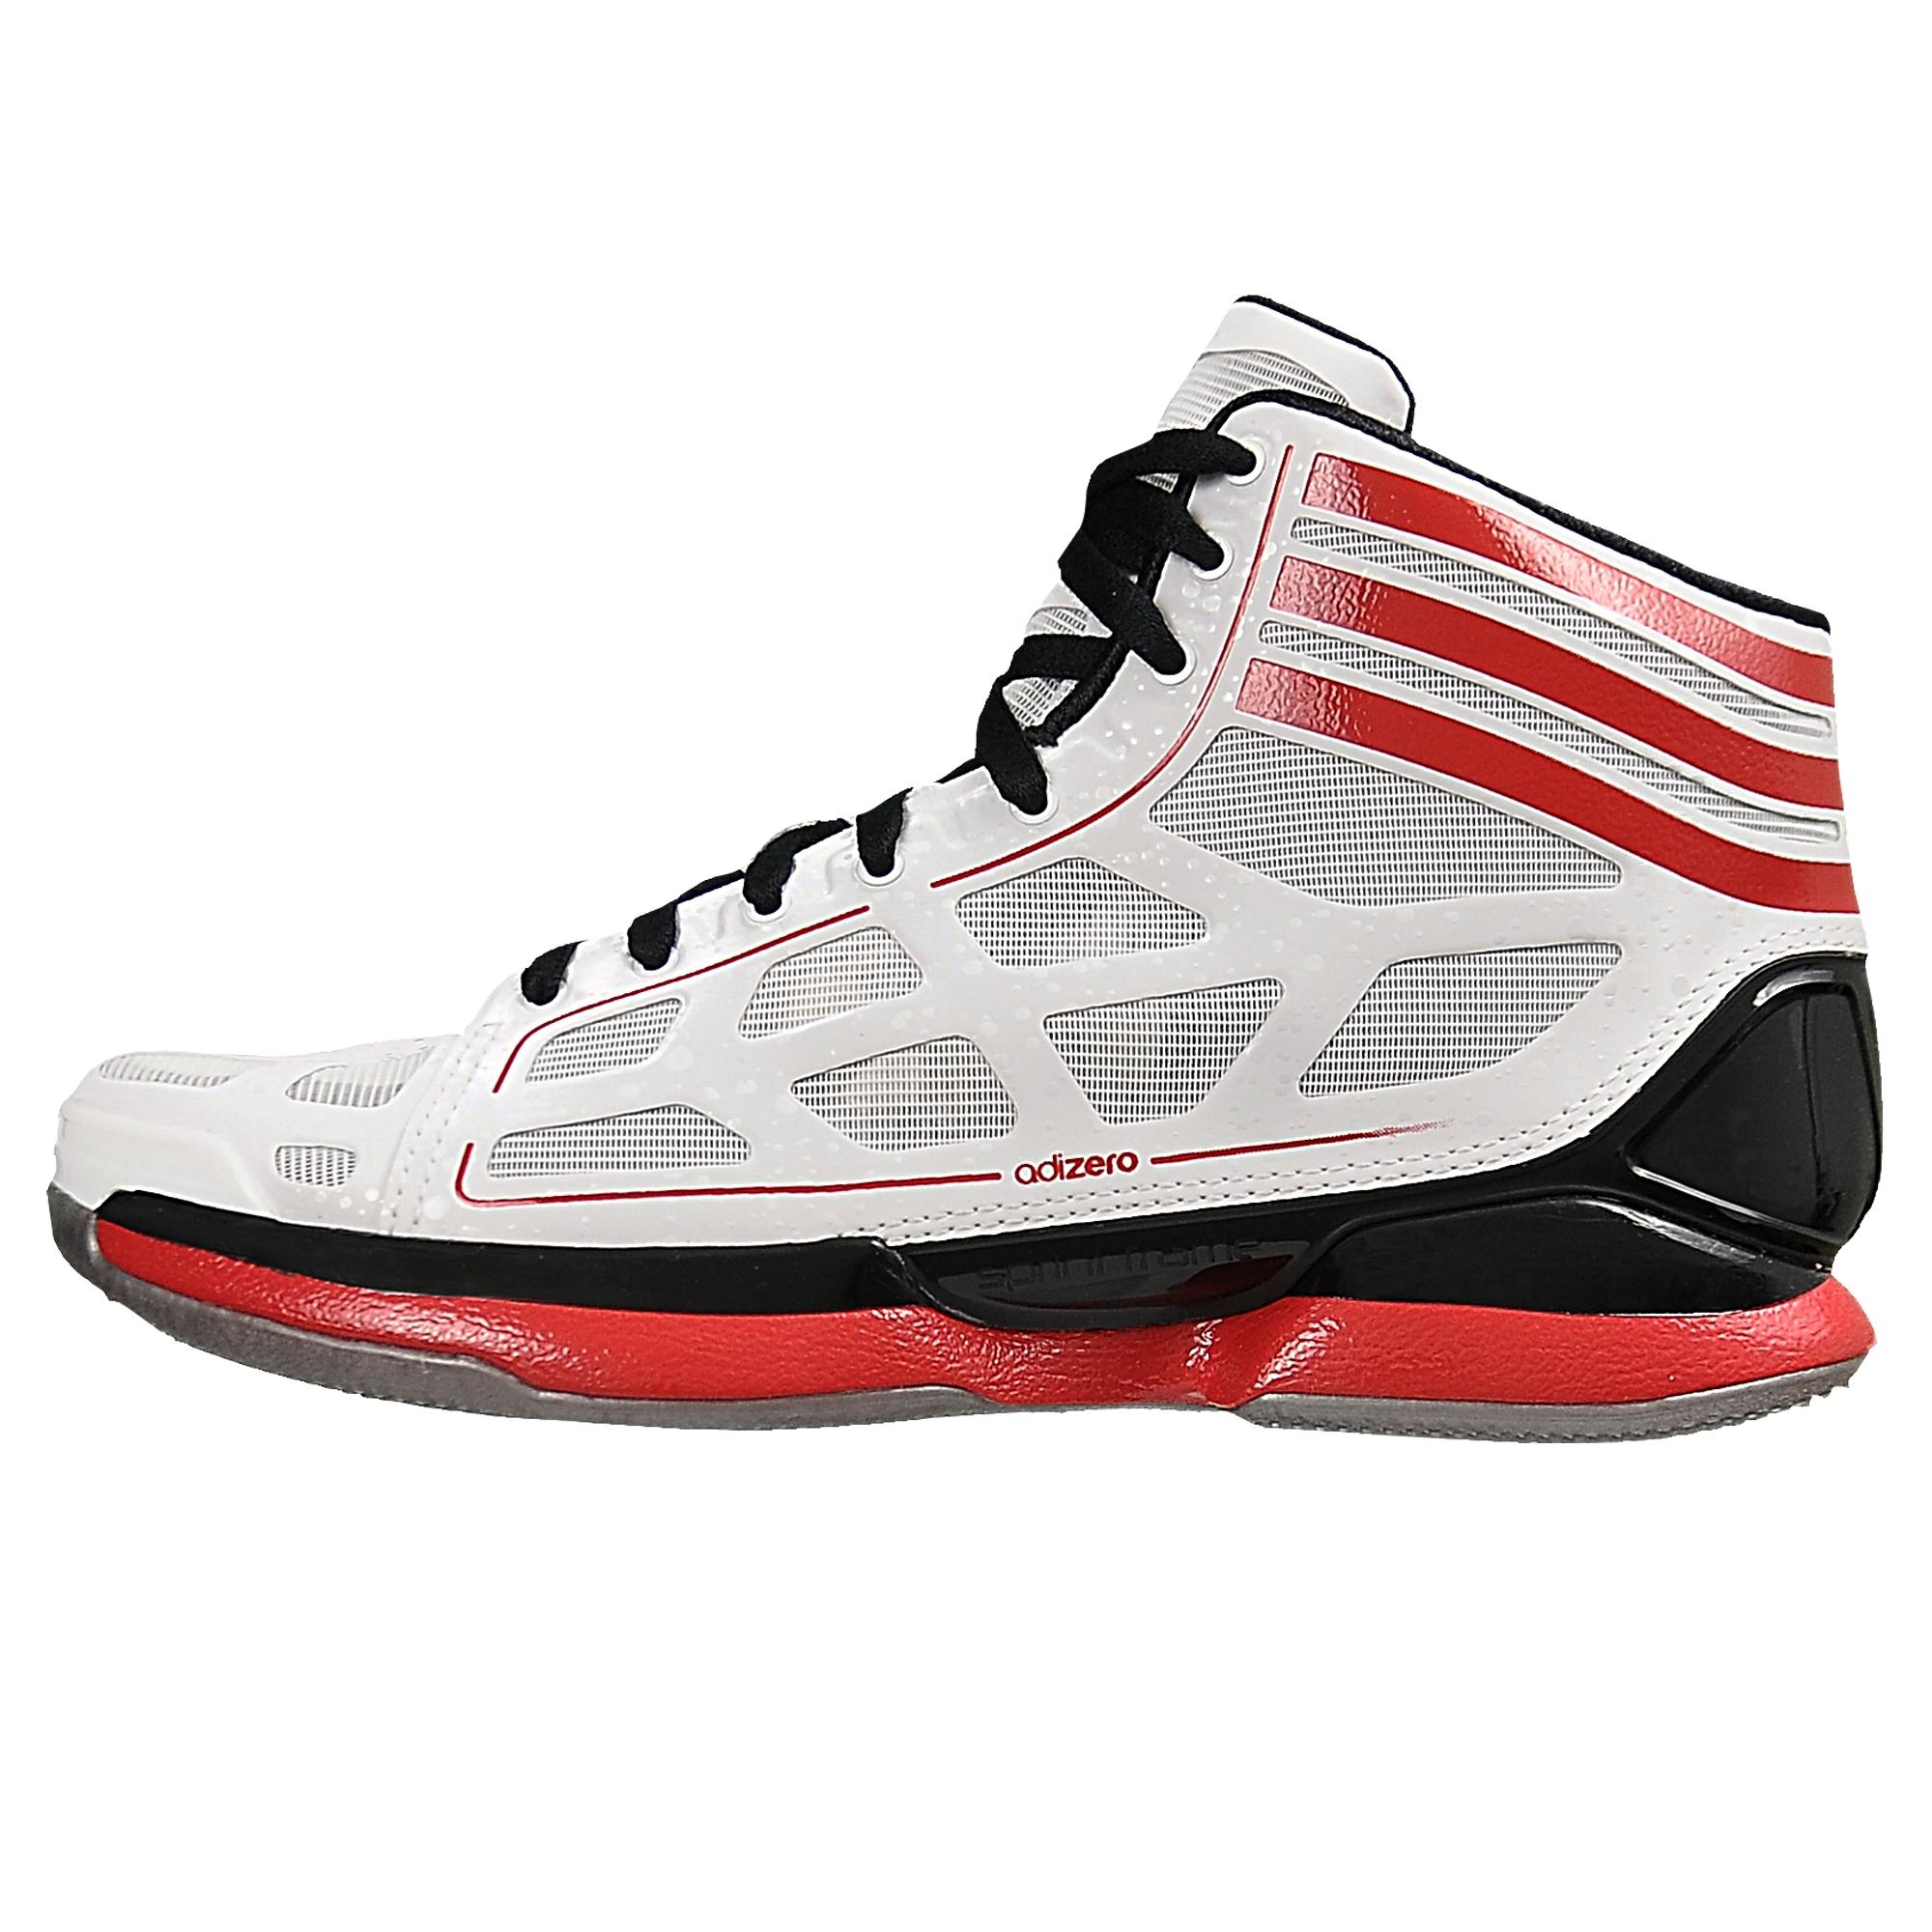 100% authentic 688c0 a0ba3 adidas Adizero Crazy Light Erkek Basketbol Ayakkabısı